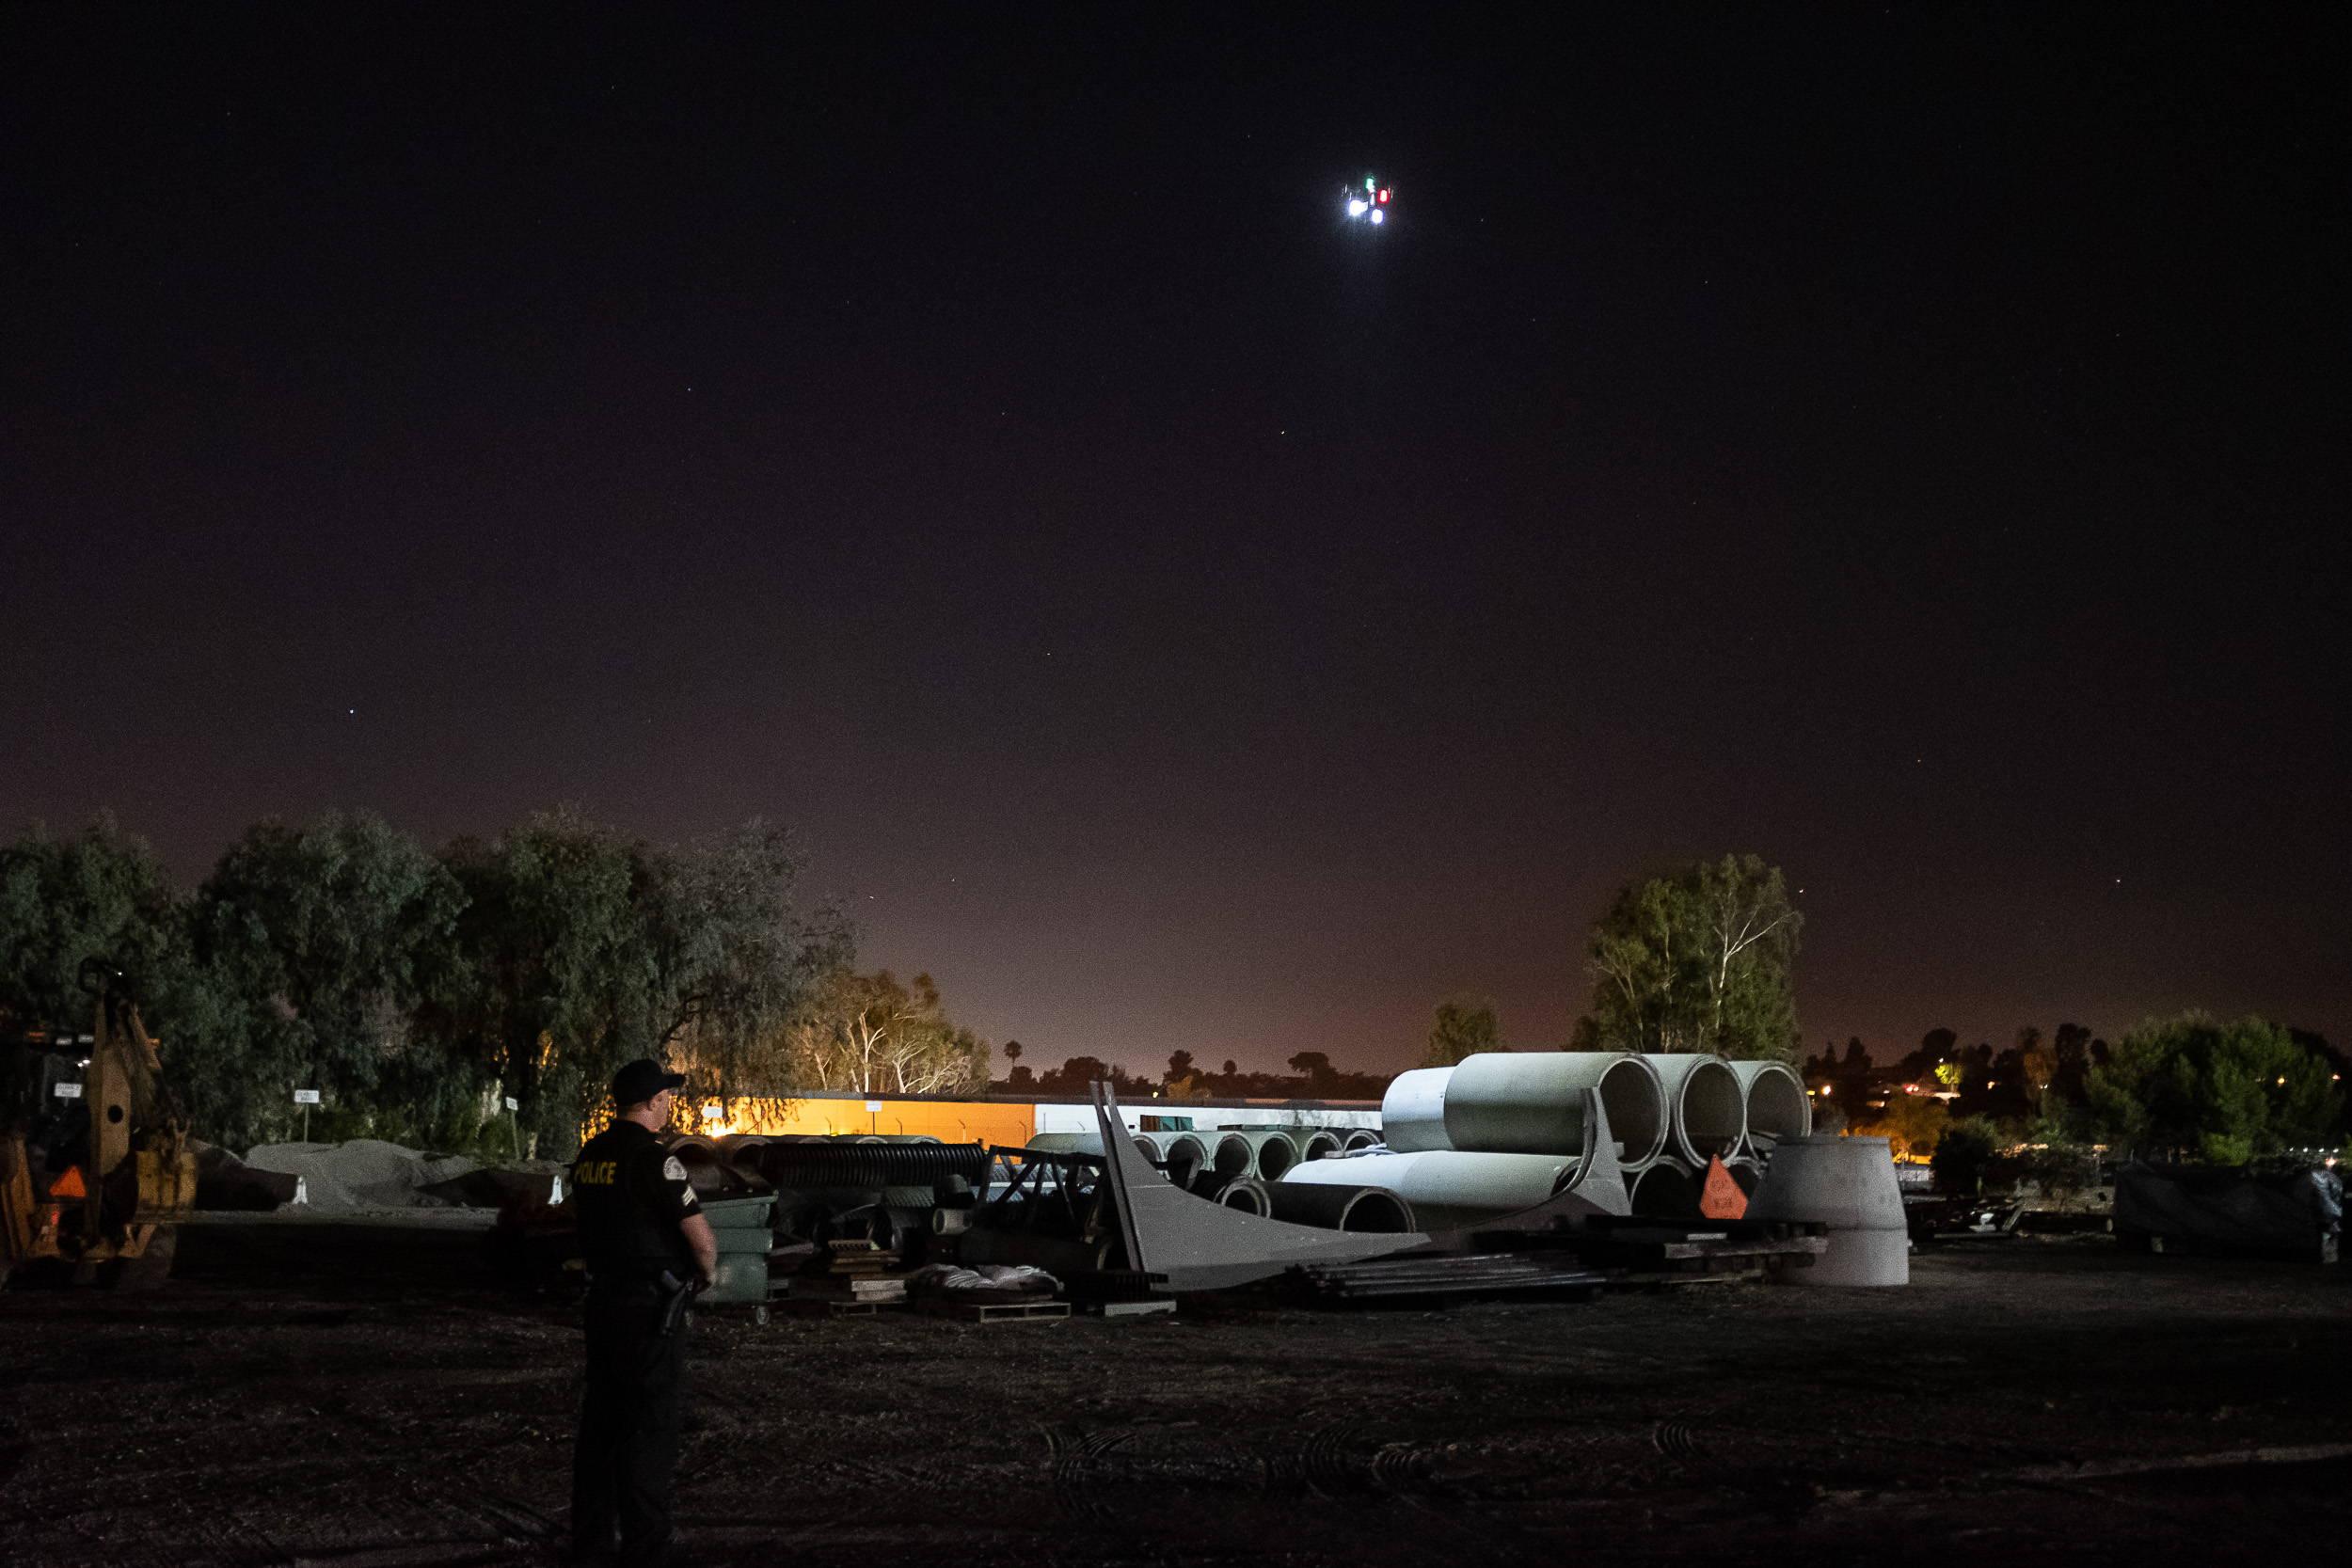 Matrice with FoxFury Rugo lights illuminates construction equipment on the ground.